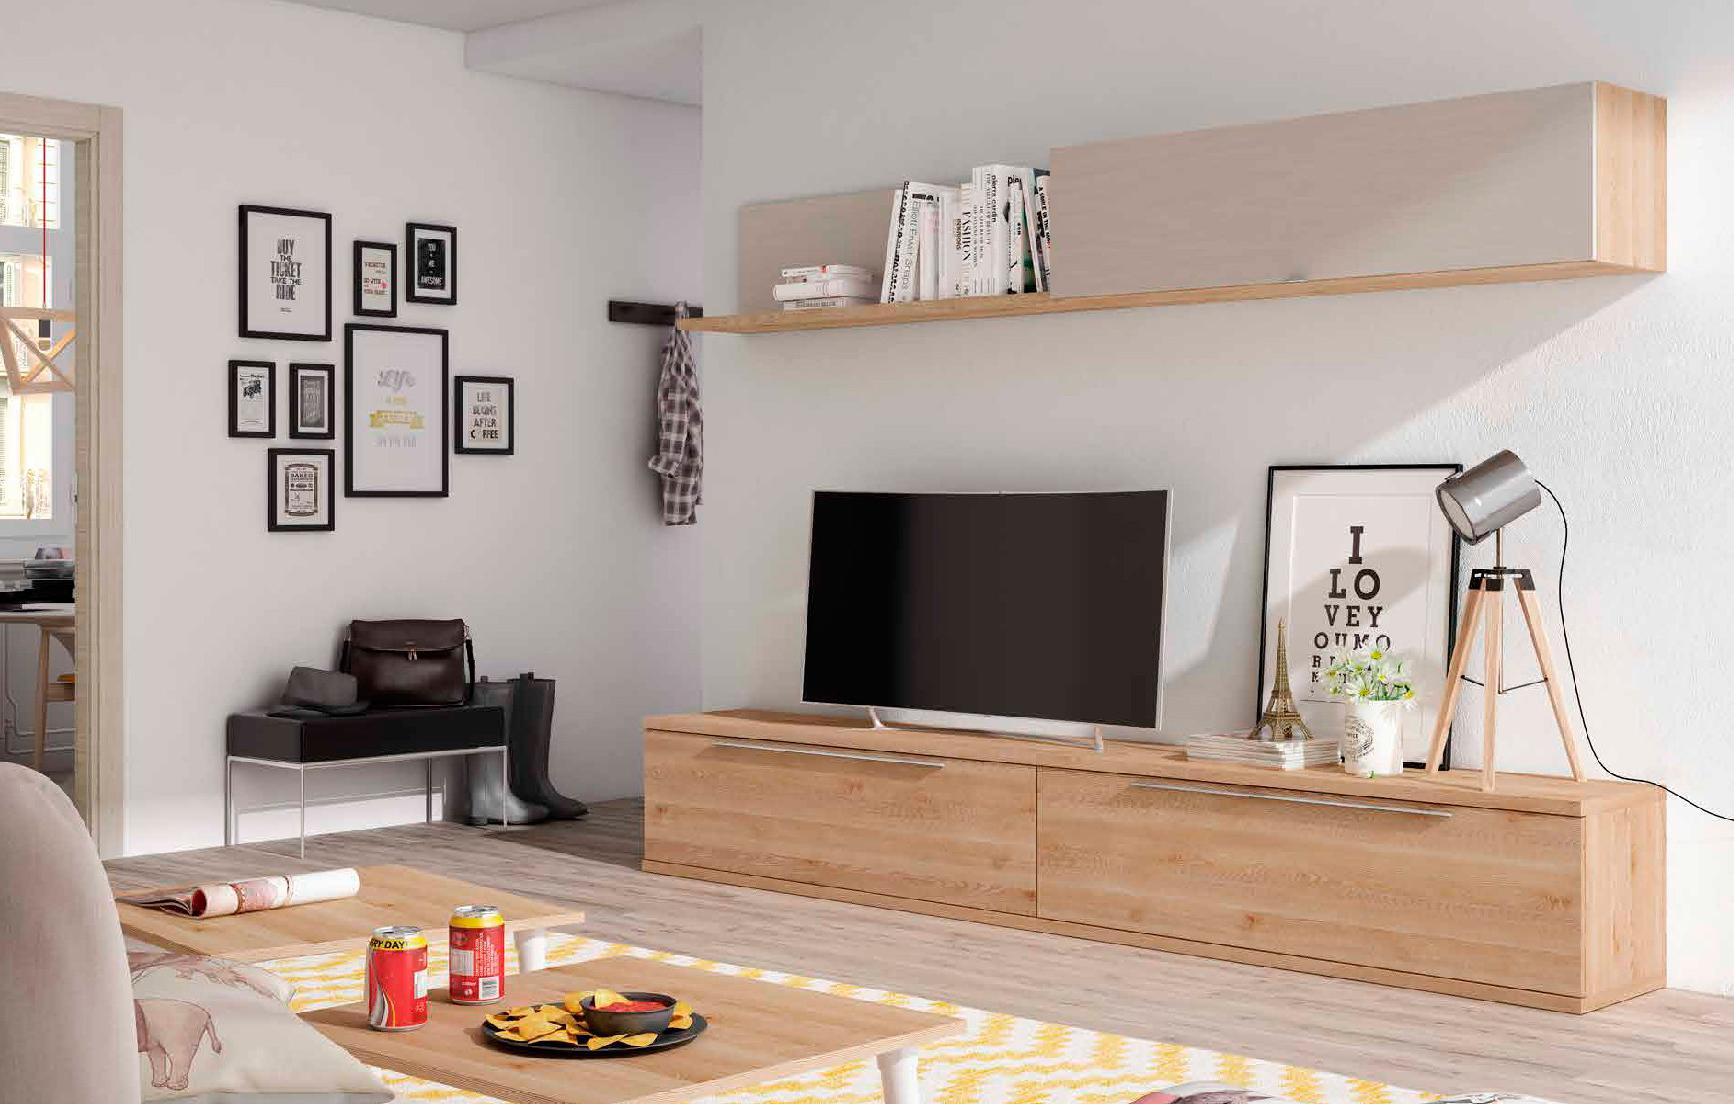 Mueble de sal n pino dan s y organic piedra muebles for Muebles de pino madrid